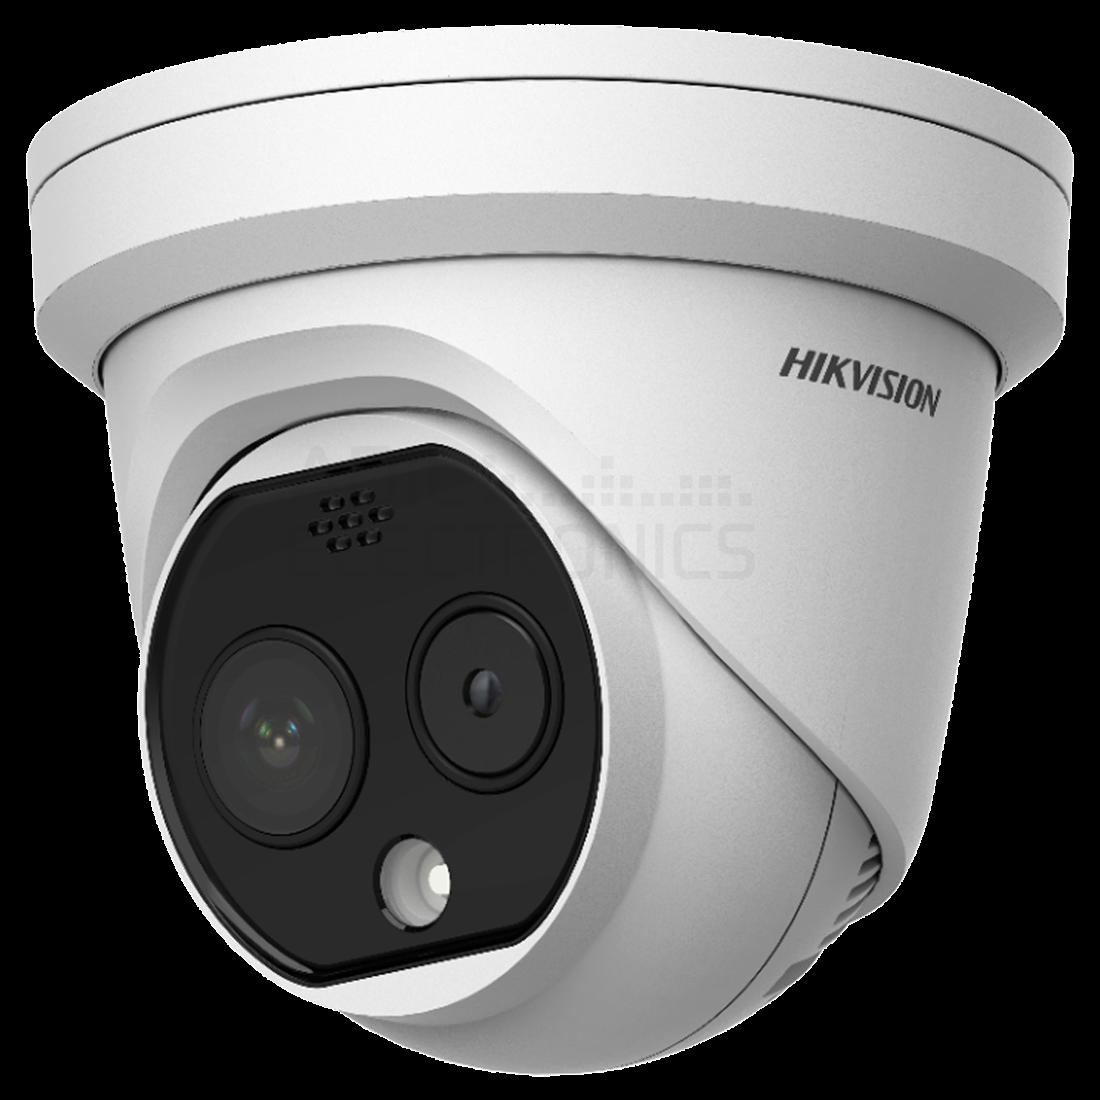 FX-10e VNIR Hyperspectral Camera (GigE Interface